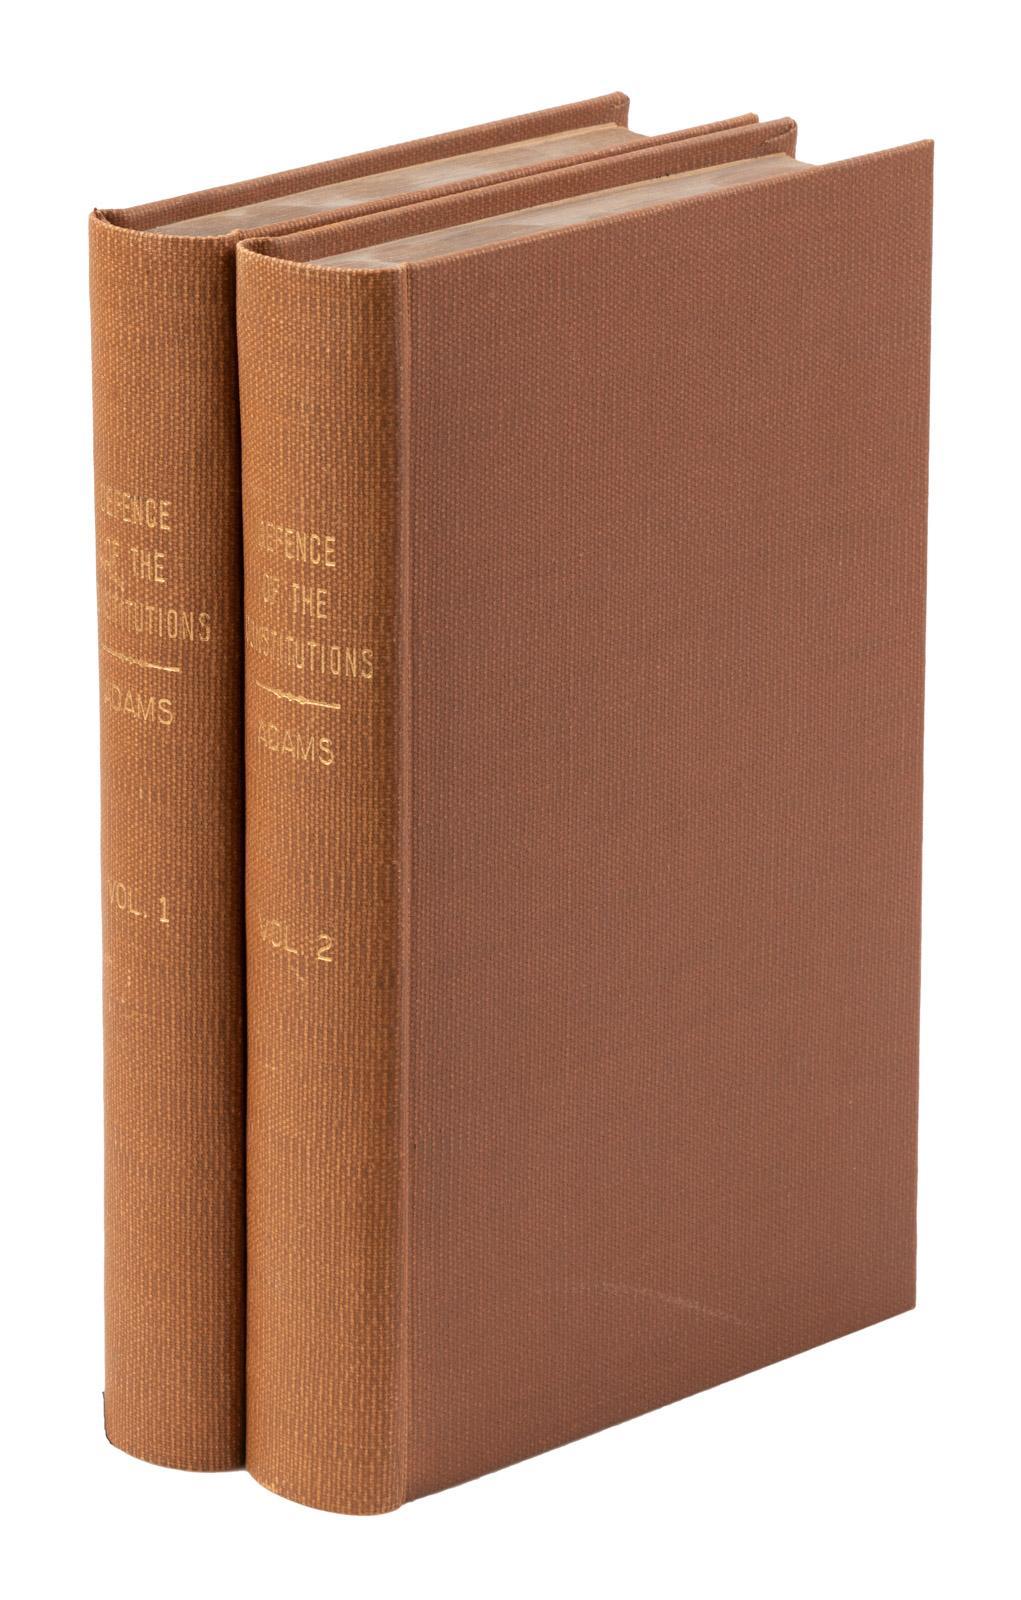 Rare Books & Manuscripts - Alcoholics Anonymous - Miniature Books